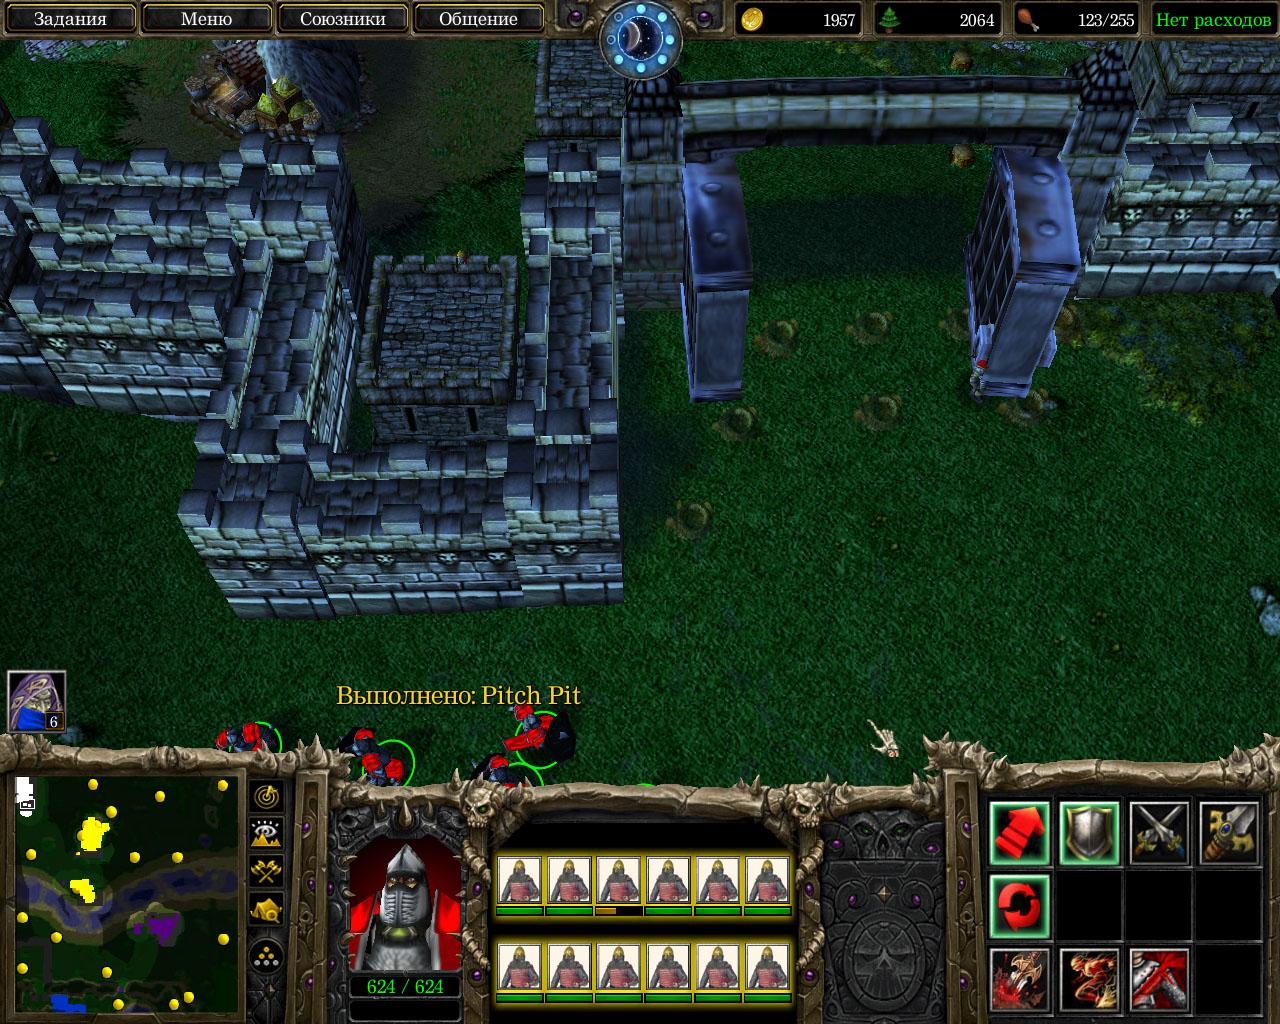 Warcraft sexmap download sexy image